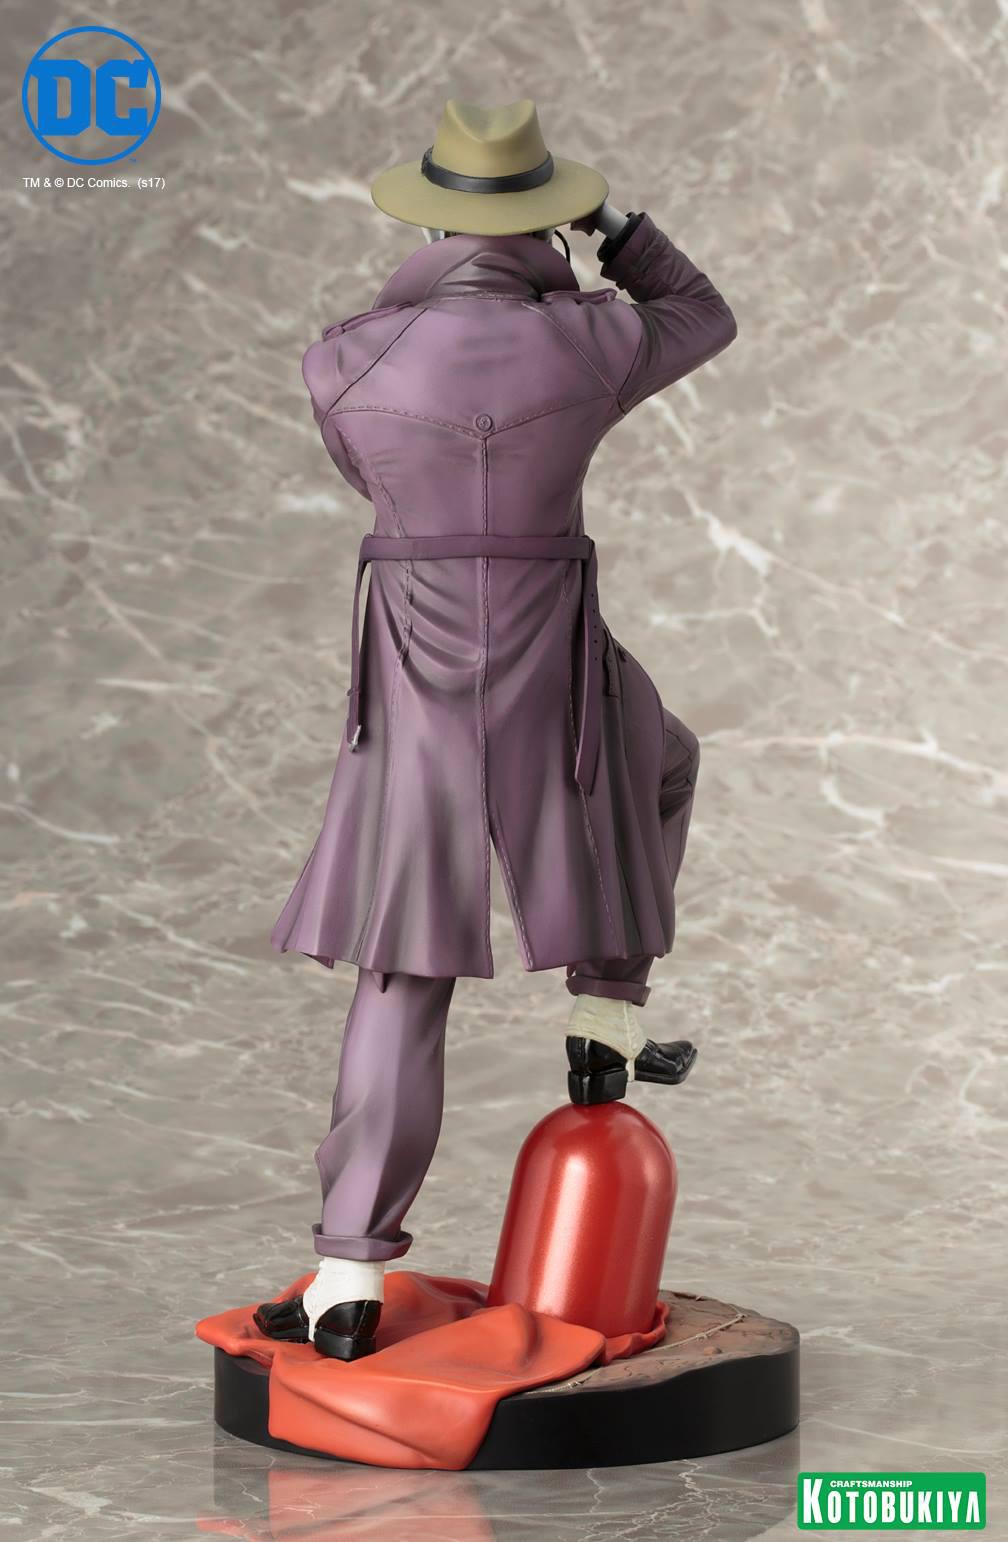 kotobukiya-joker-the-killing-joke-statue-6